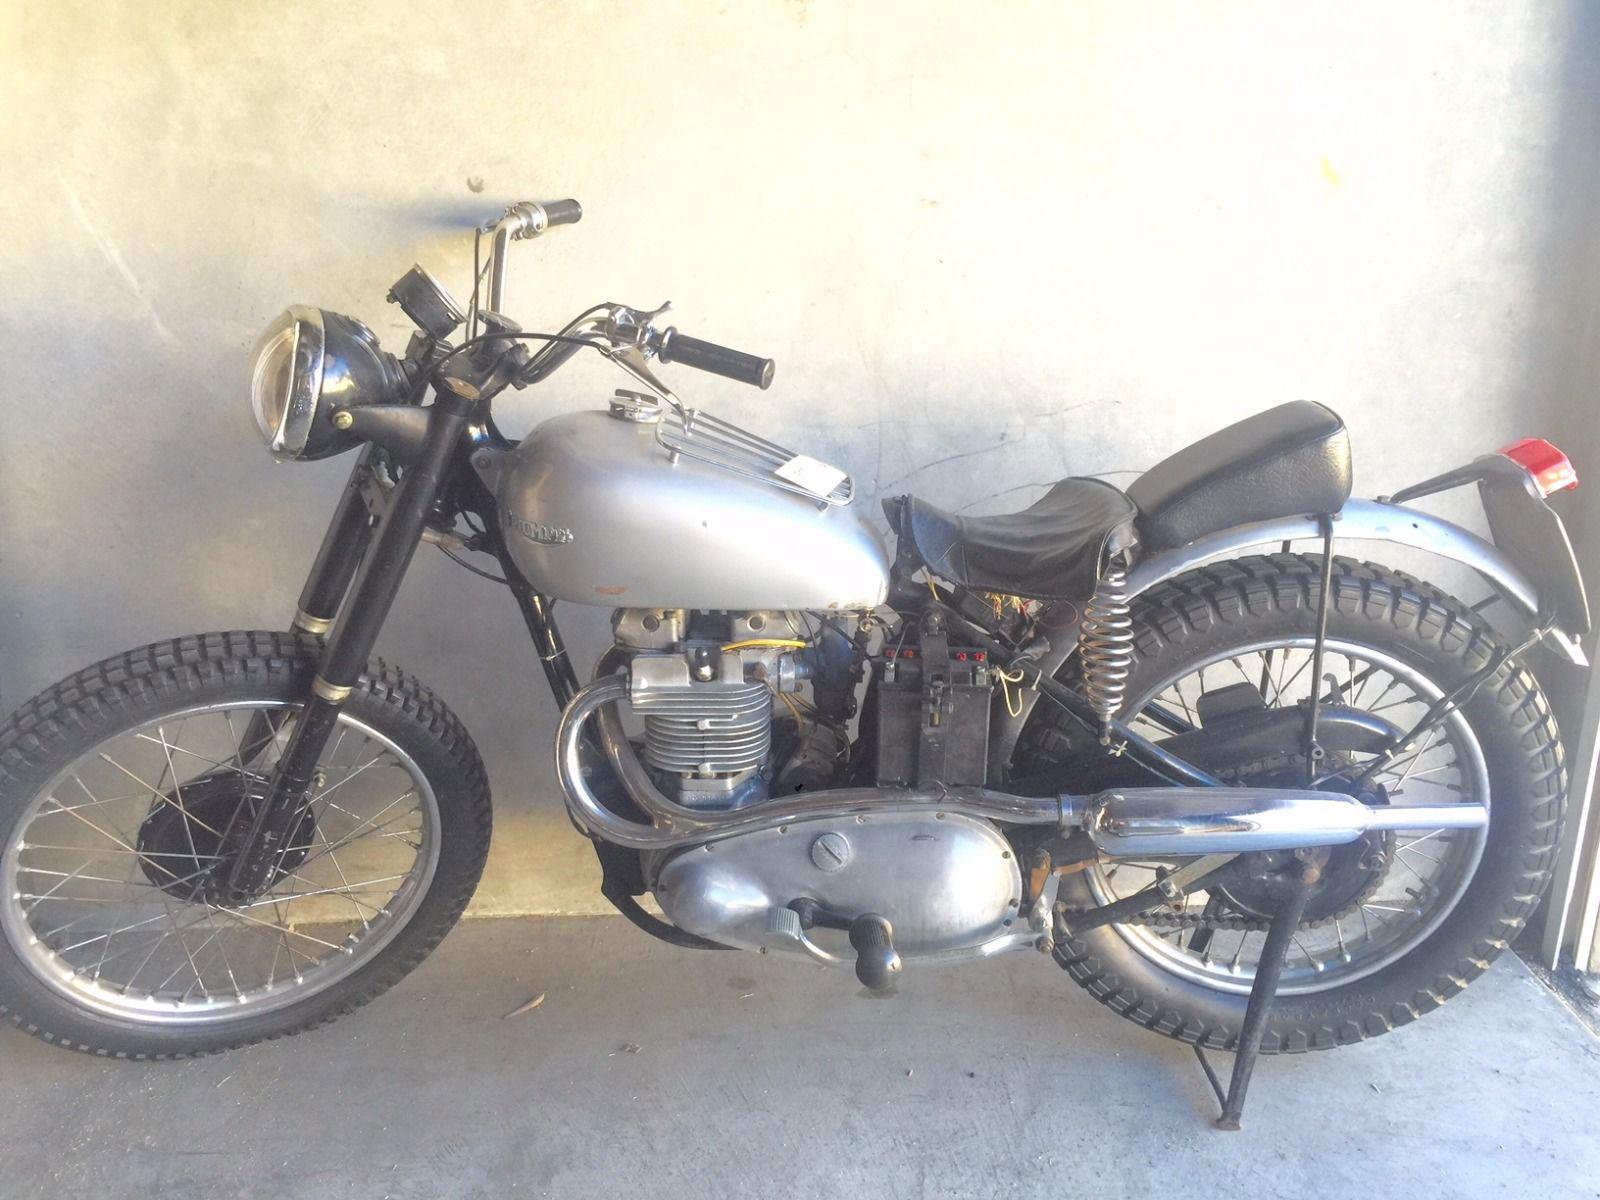 Fonzies-Happy-Days-Televison-Series-Triumph-Motorcycle-1-2